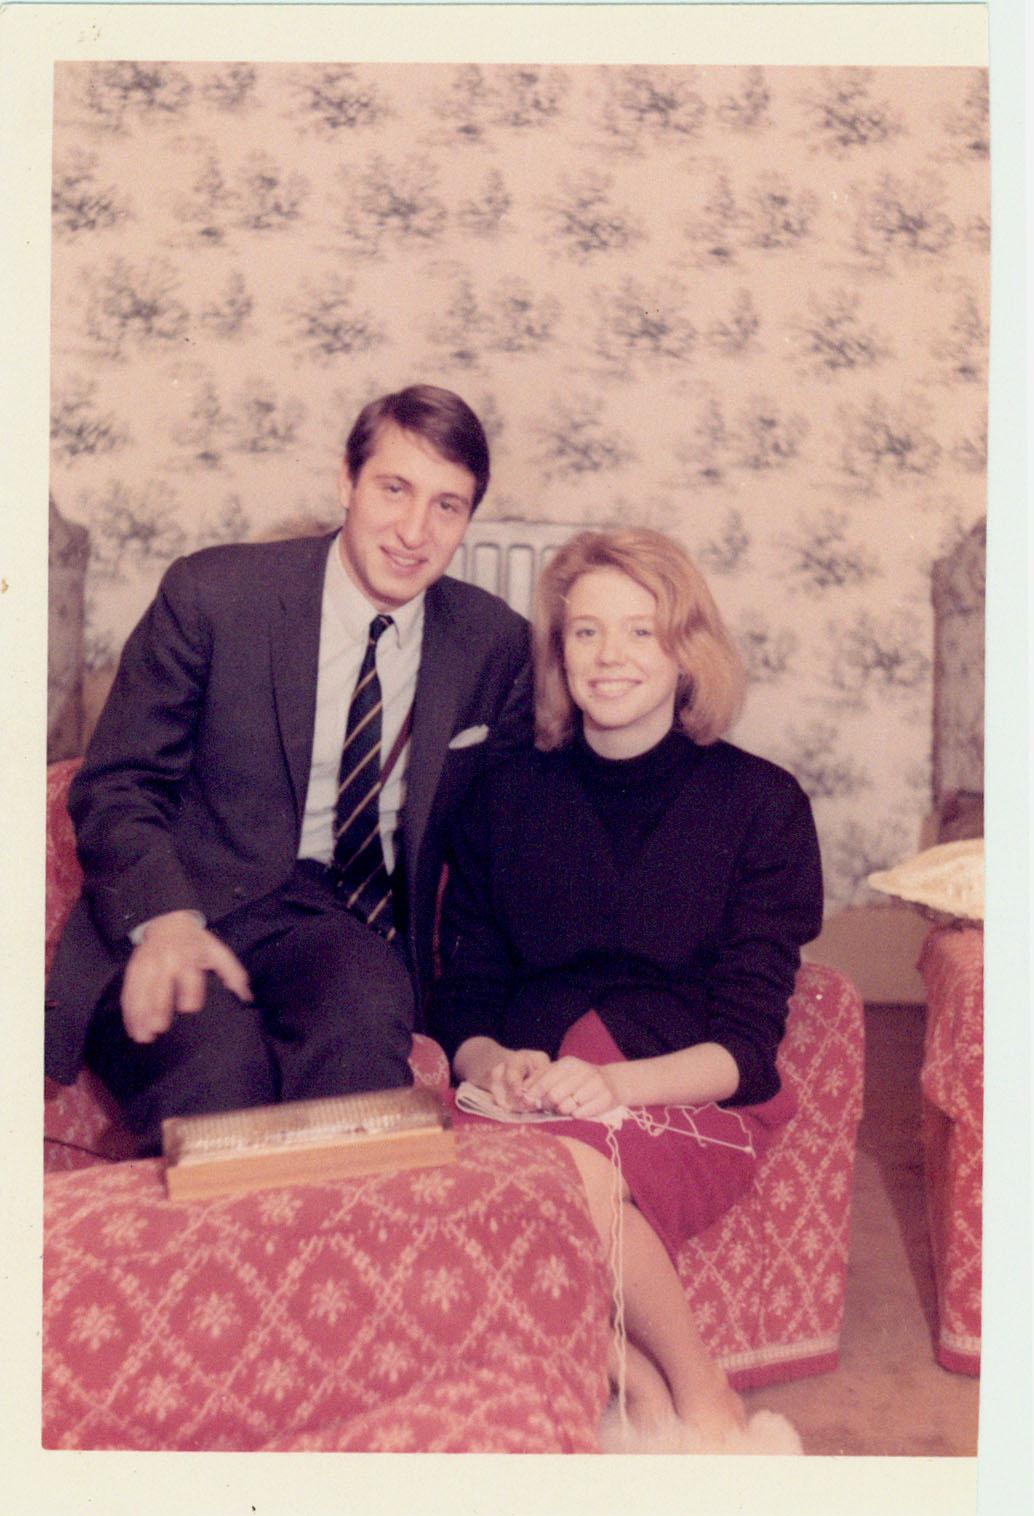 Enzo e Carola 1965 (e Laudie) - Londra 1965 - © Laudie Nocera